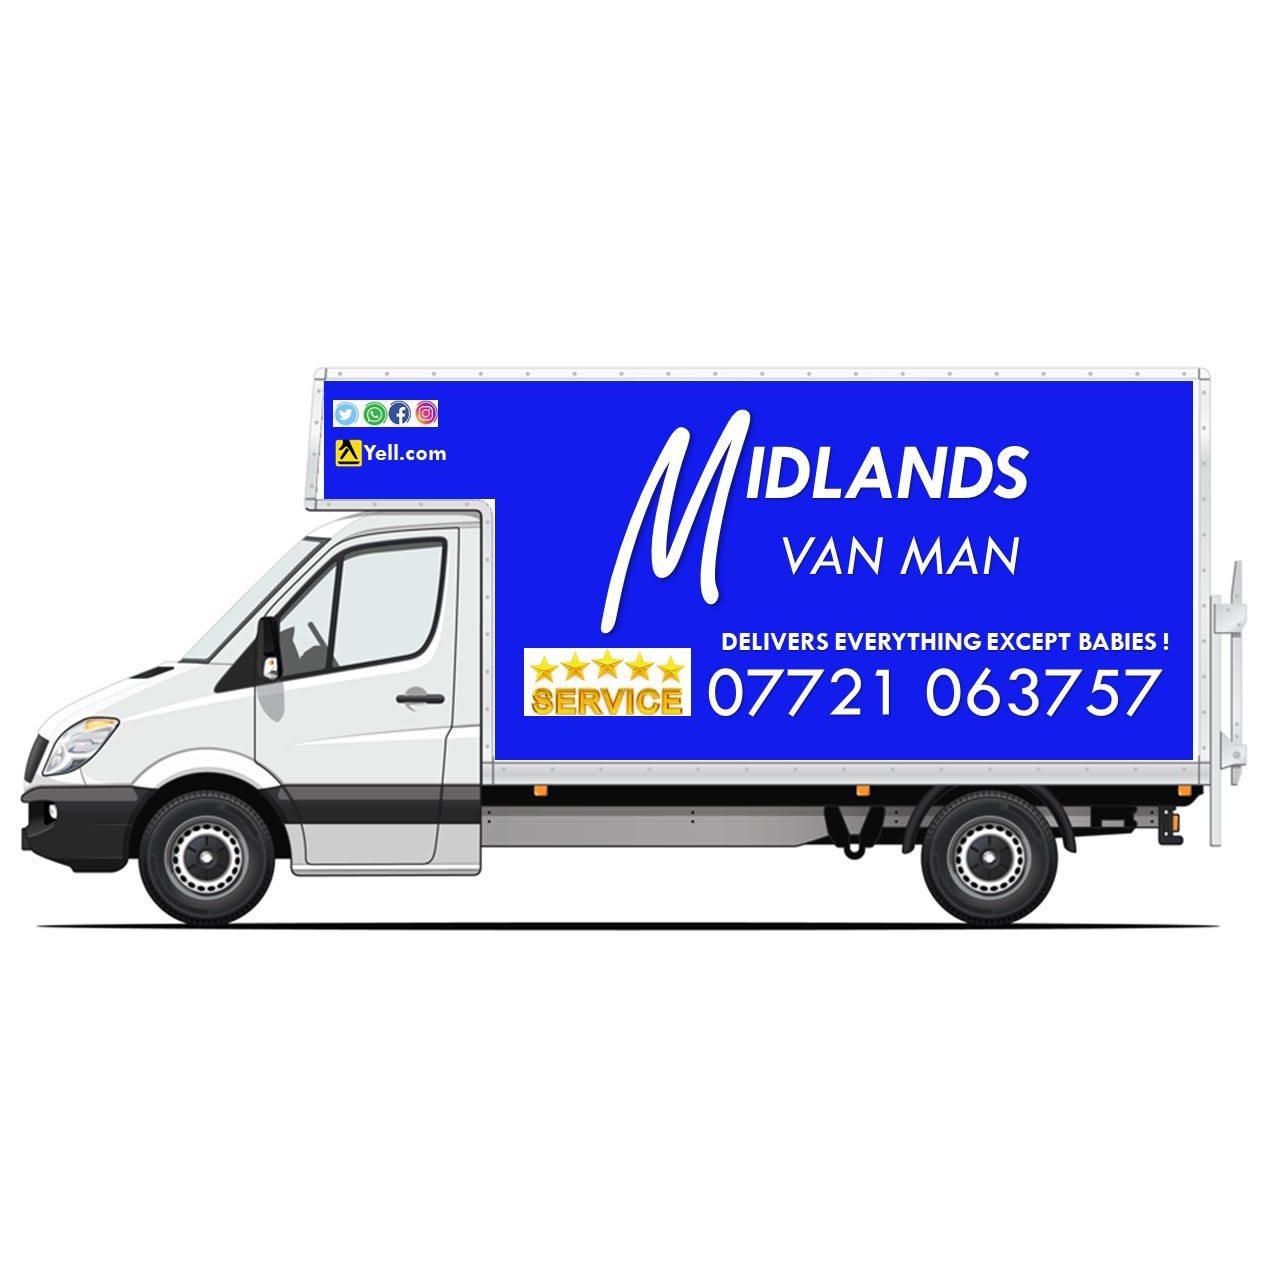 Midlands Vanman - Dudley, West Midlands DY1 2EF - 07721 063757 | ShowMeLocal.com